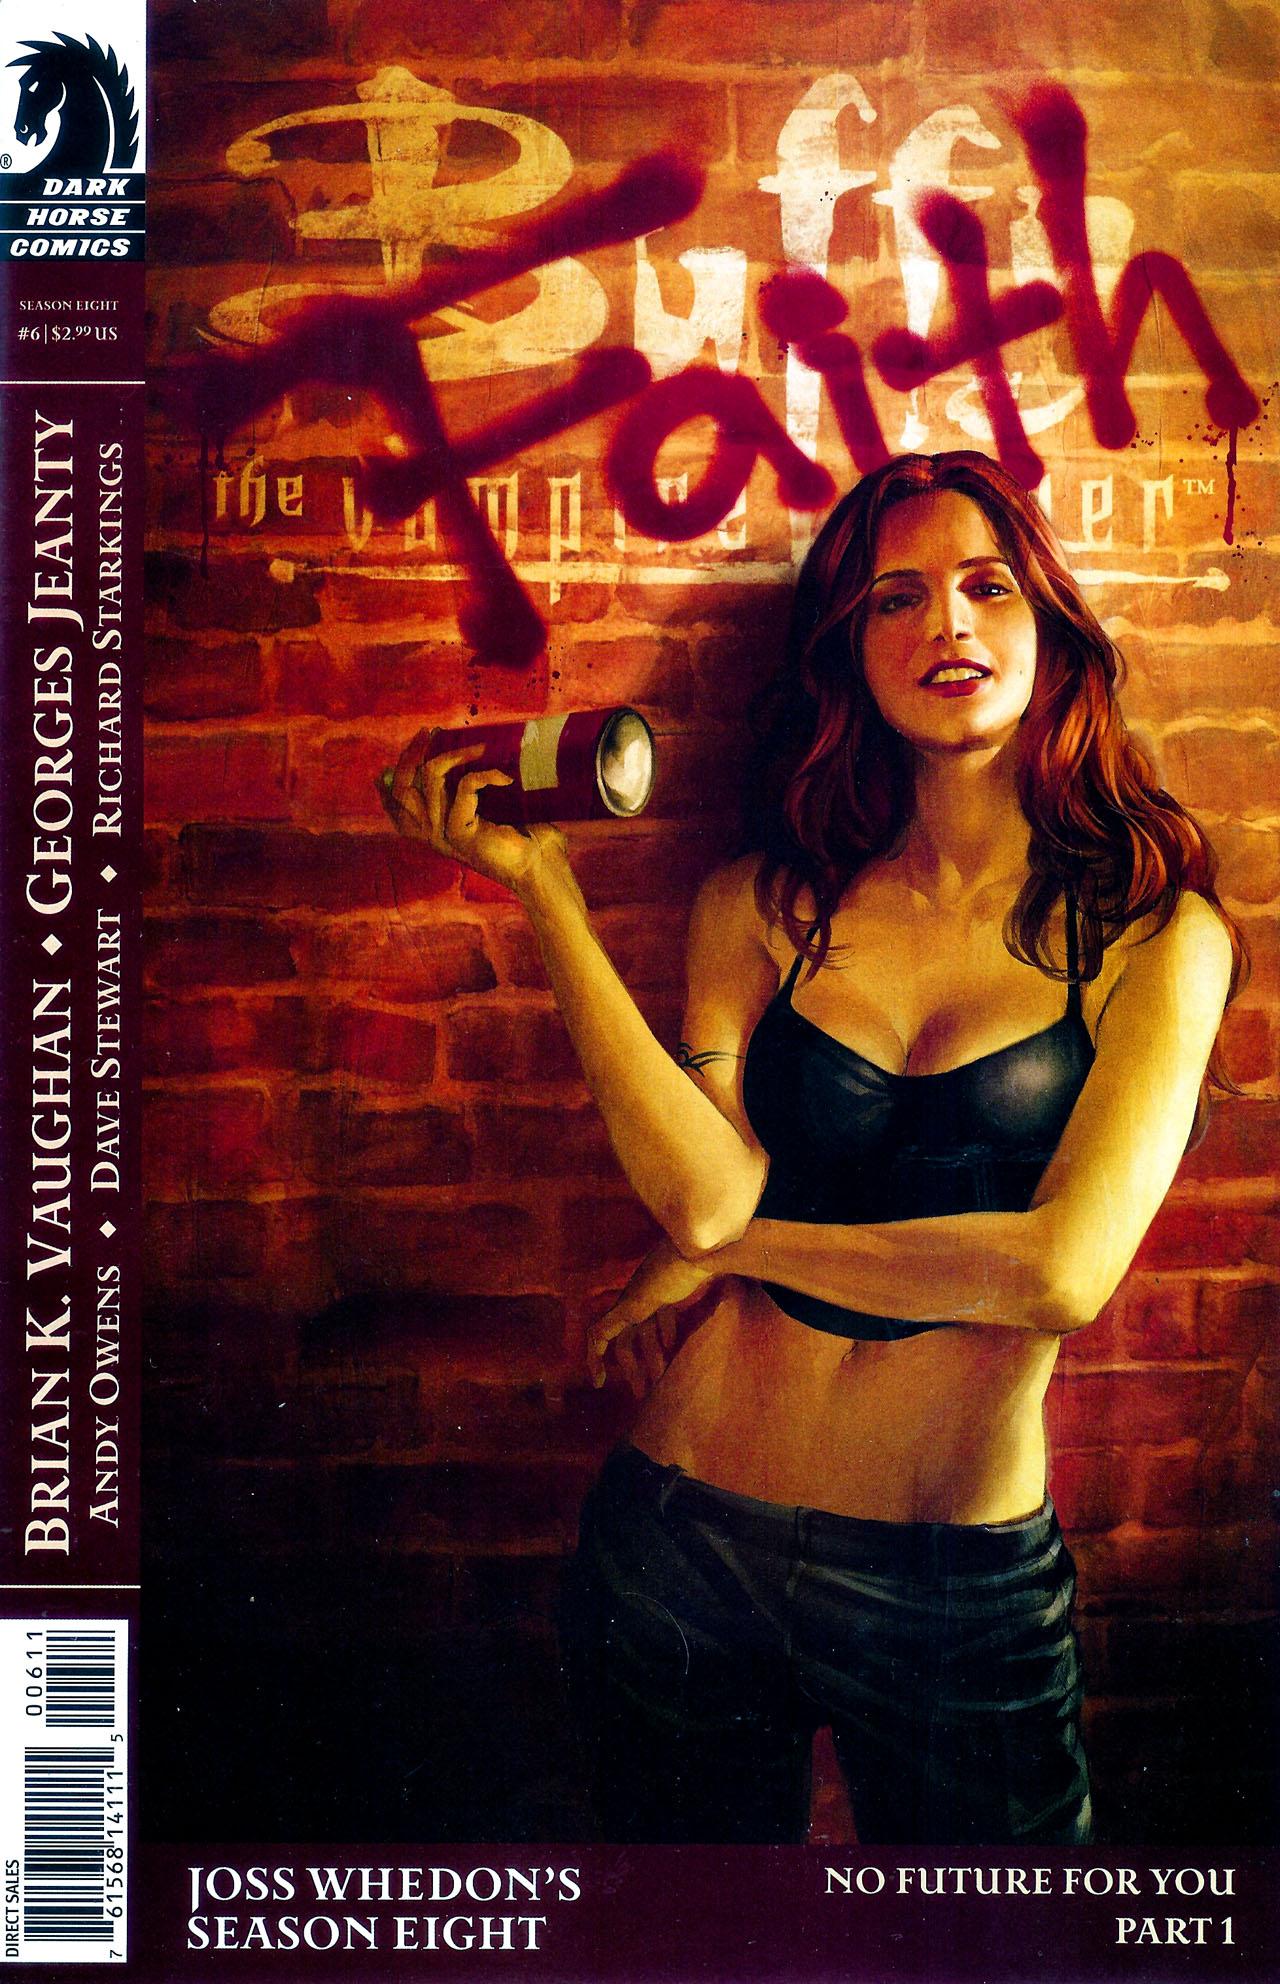 Buffy the Vampire Slayer Season Eight 6 Page 1